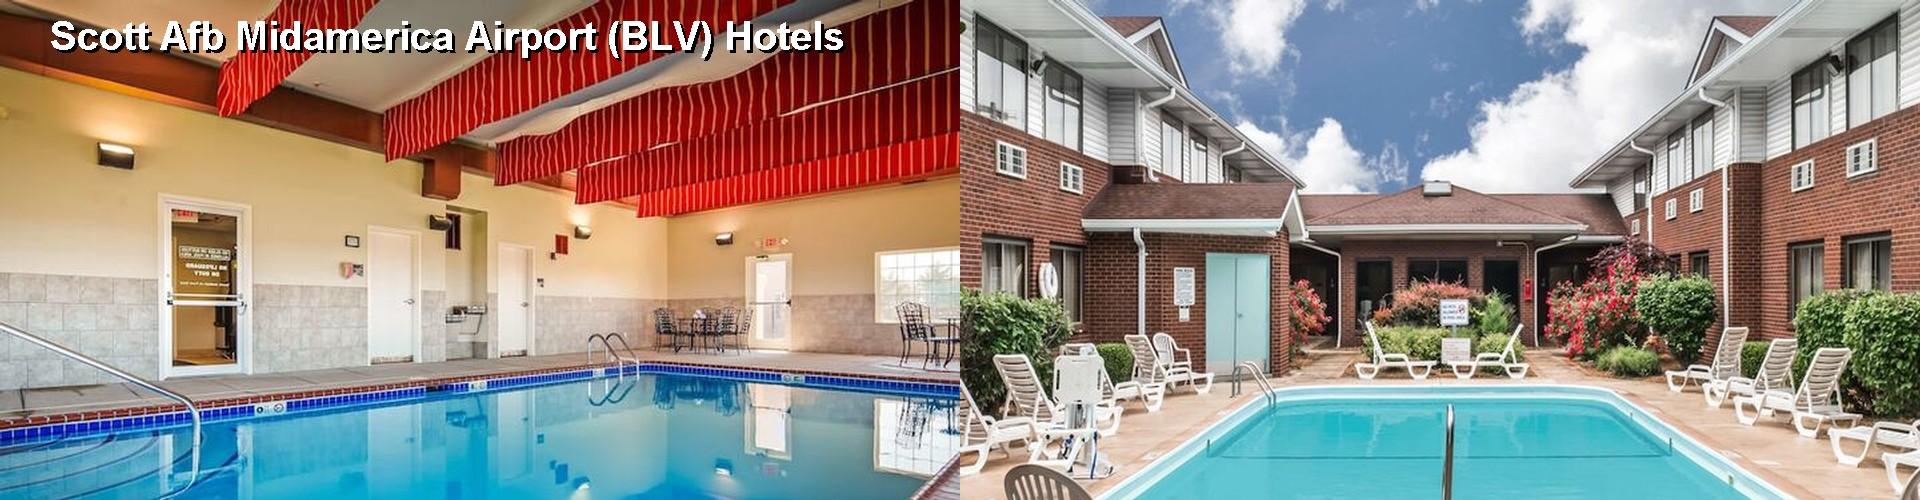 5 Best Hotels Near Scott Afb Midamerica Airport Blv